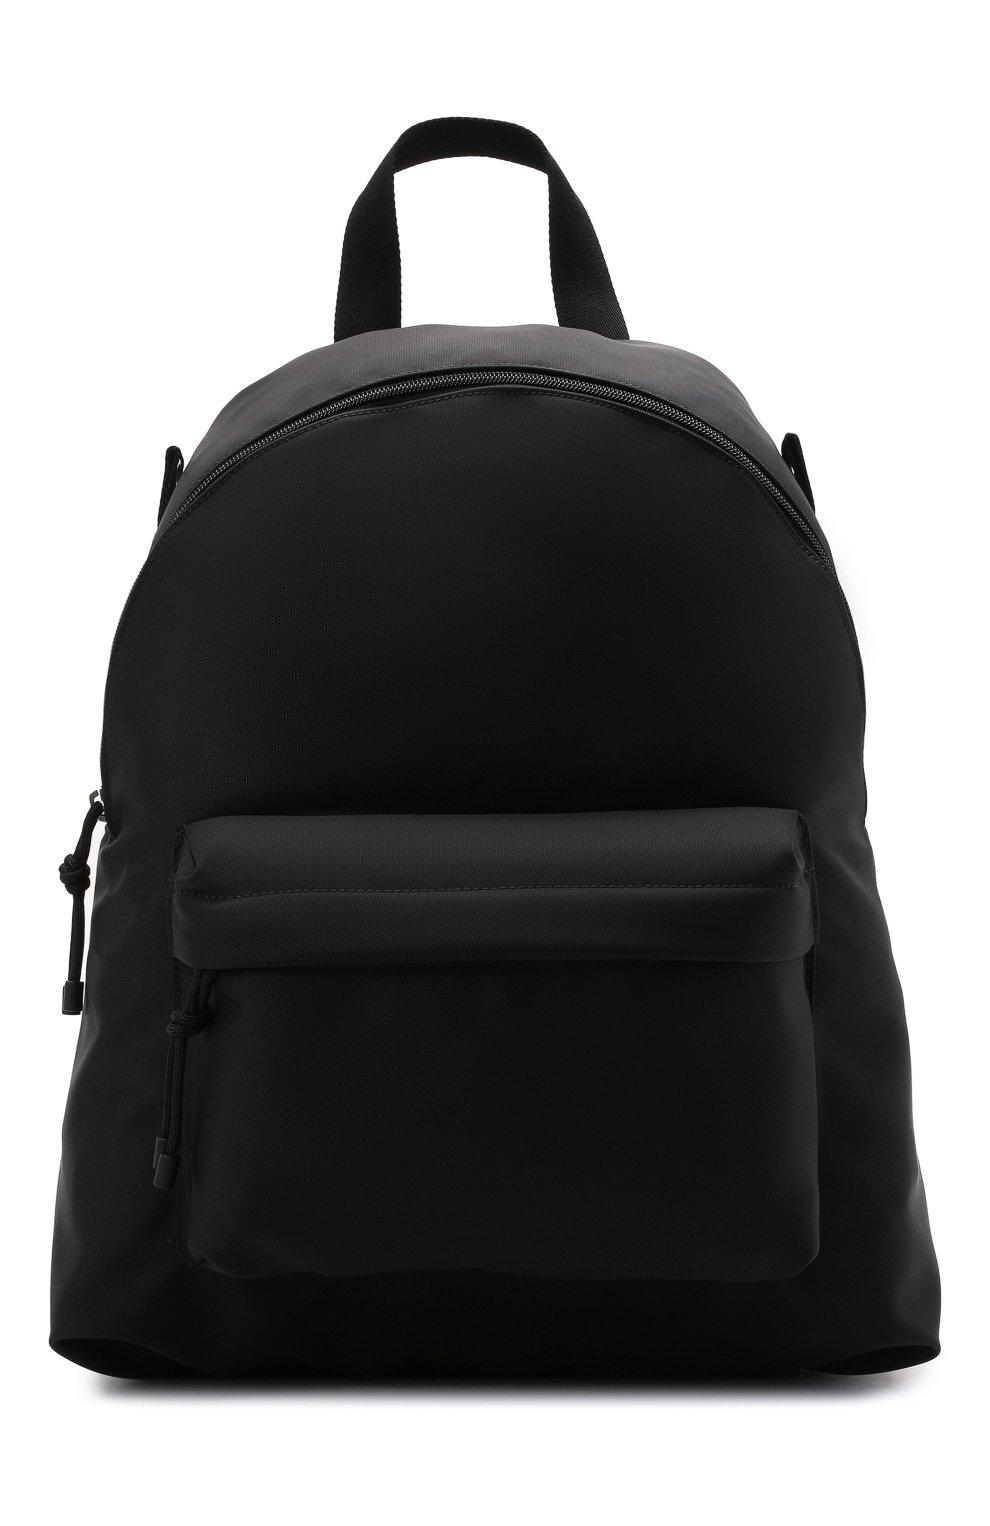 Мужской текстильный рюкзак VALENTINO черного цвета, арт. WY2B0A98/HQH | Фото 1 (Ремень/цепочка: На ремешке; Материал: Текстиль)